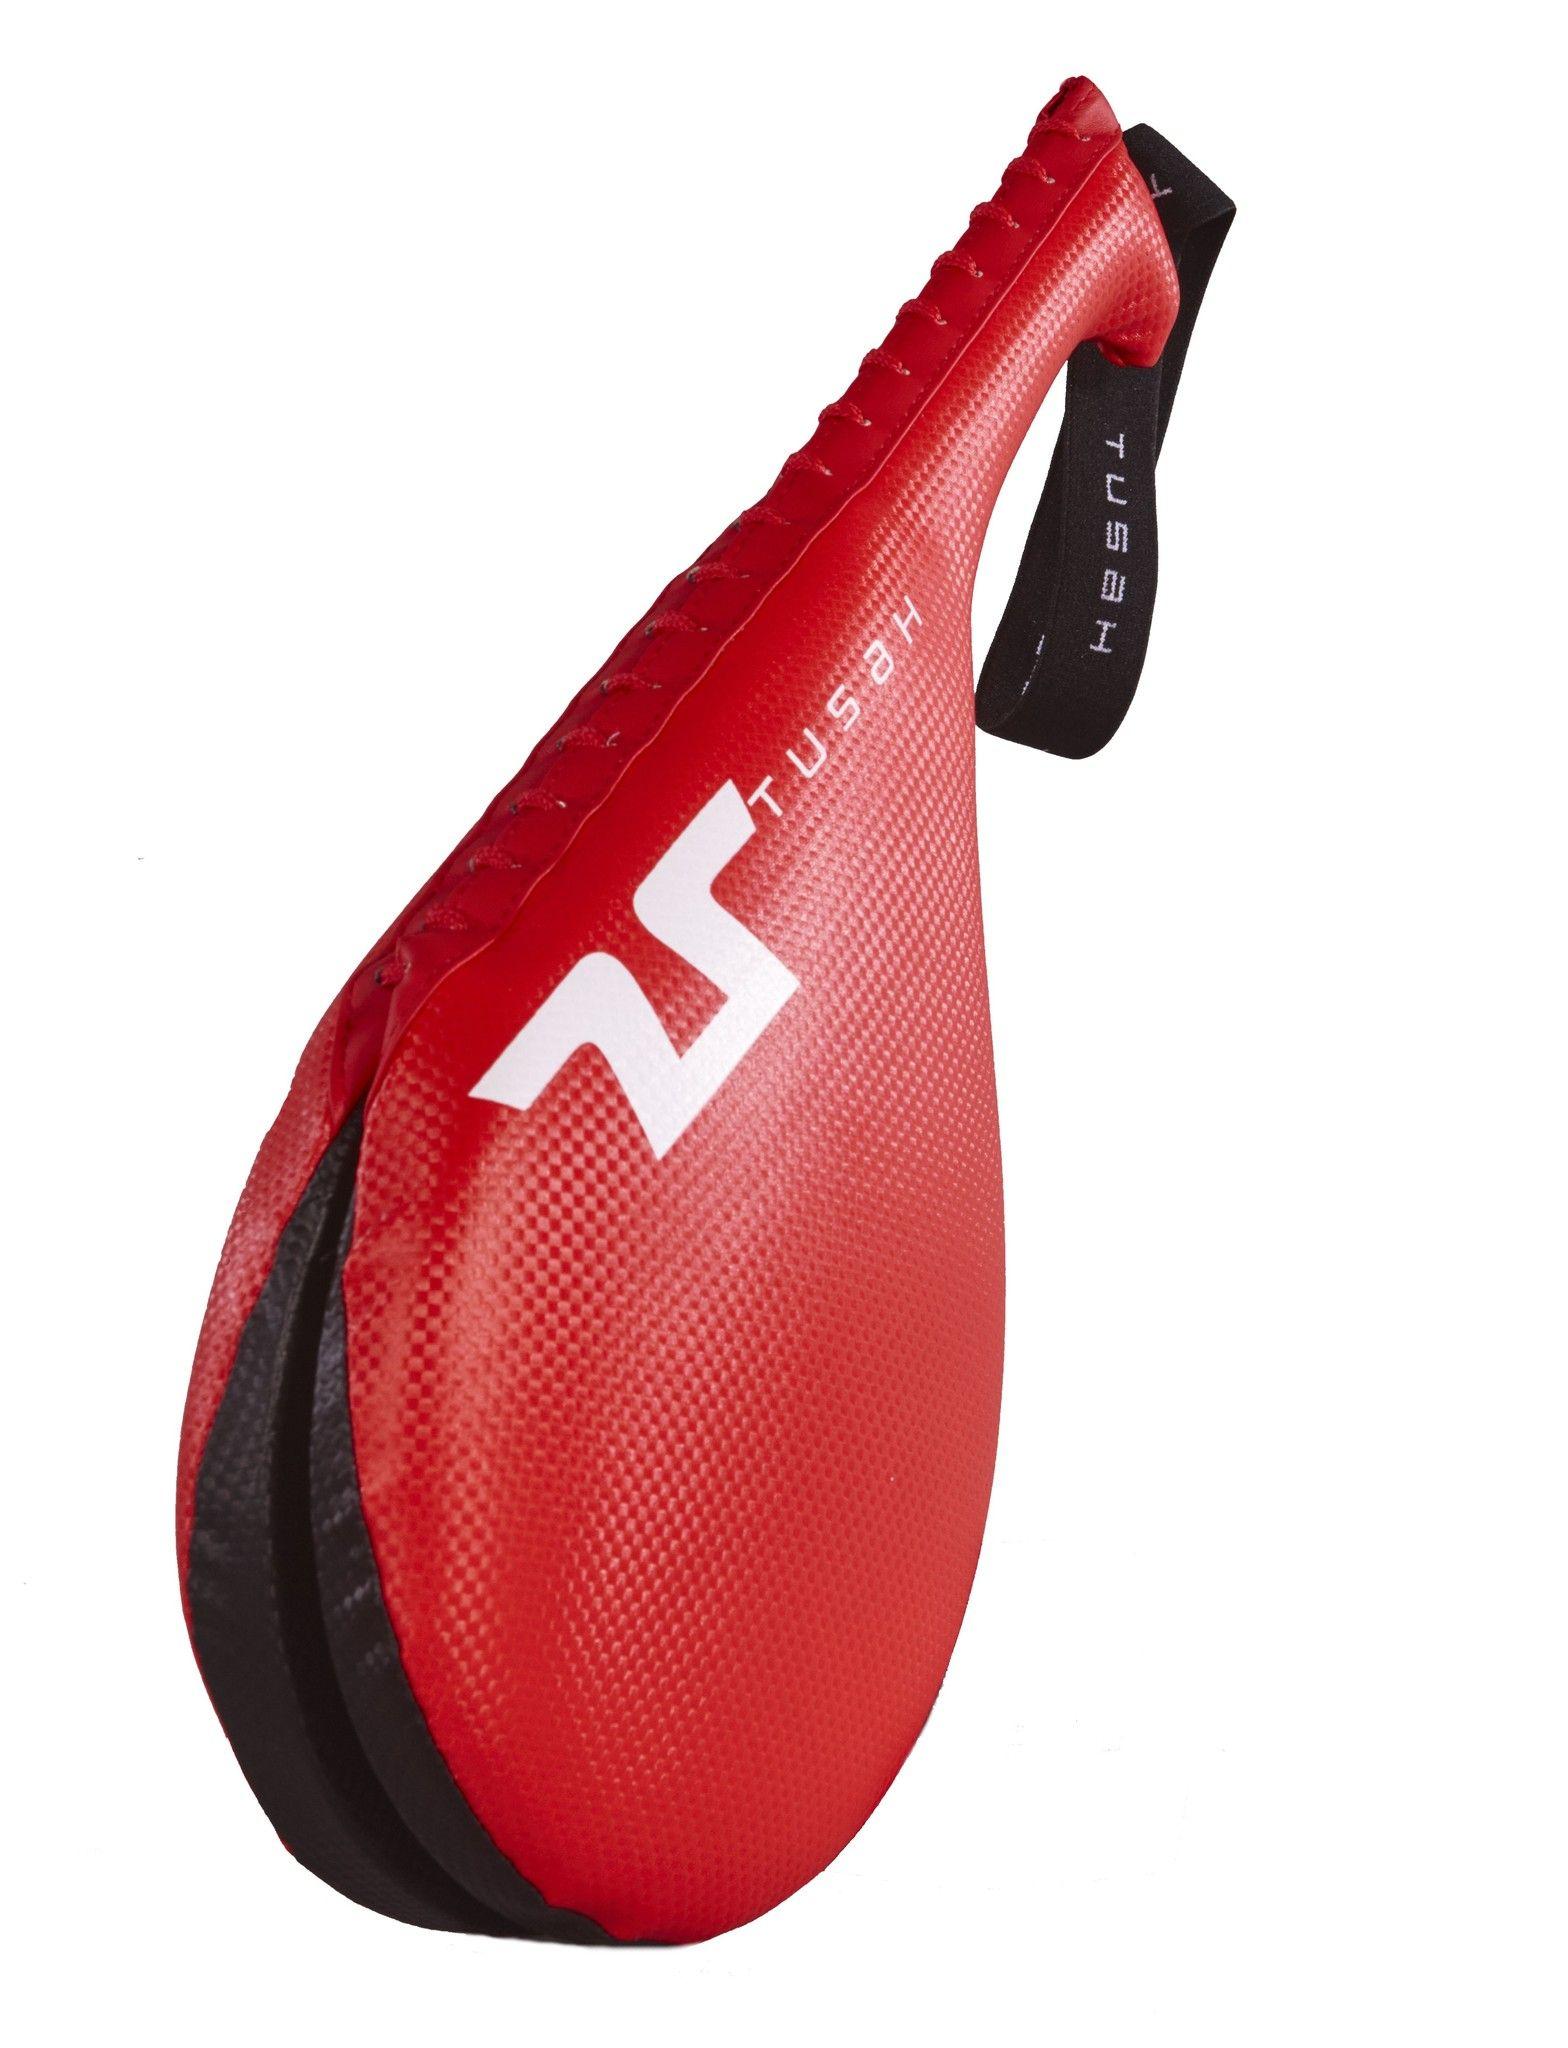 Tusah - Colpitore Doppio Rosso paletta per Taekwondo, Karate Kicktarget